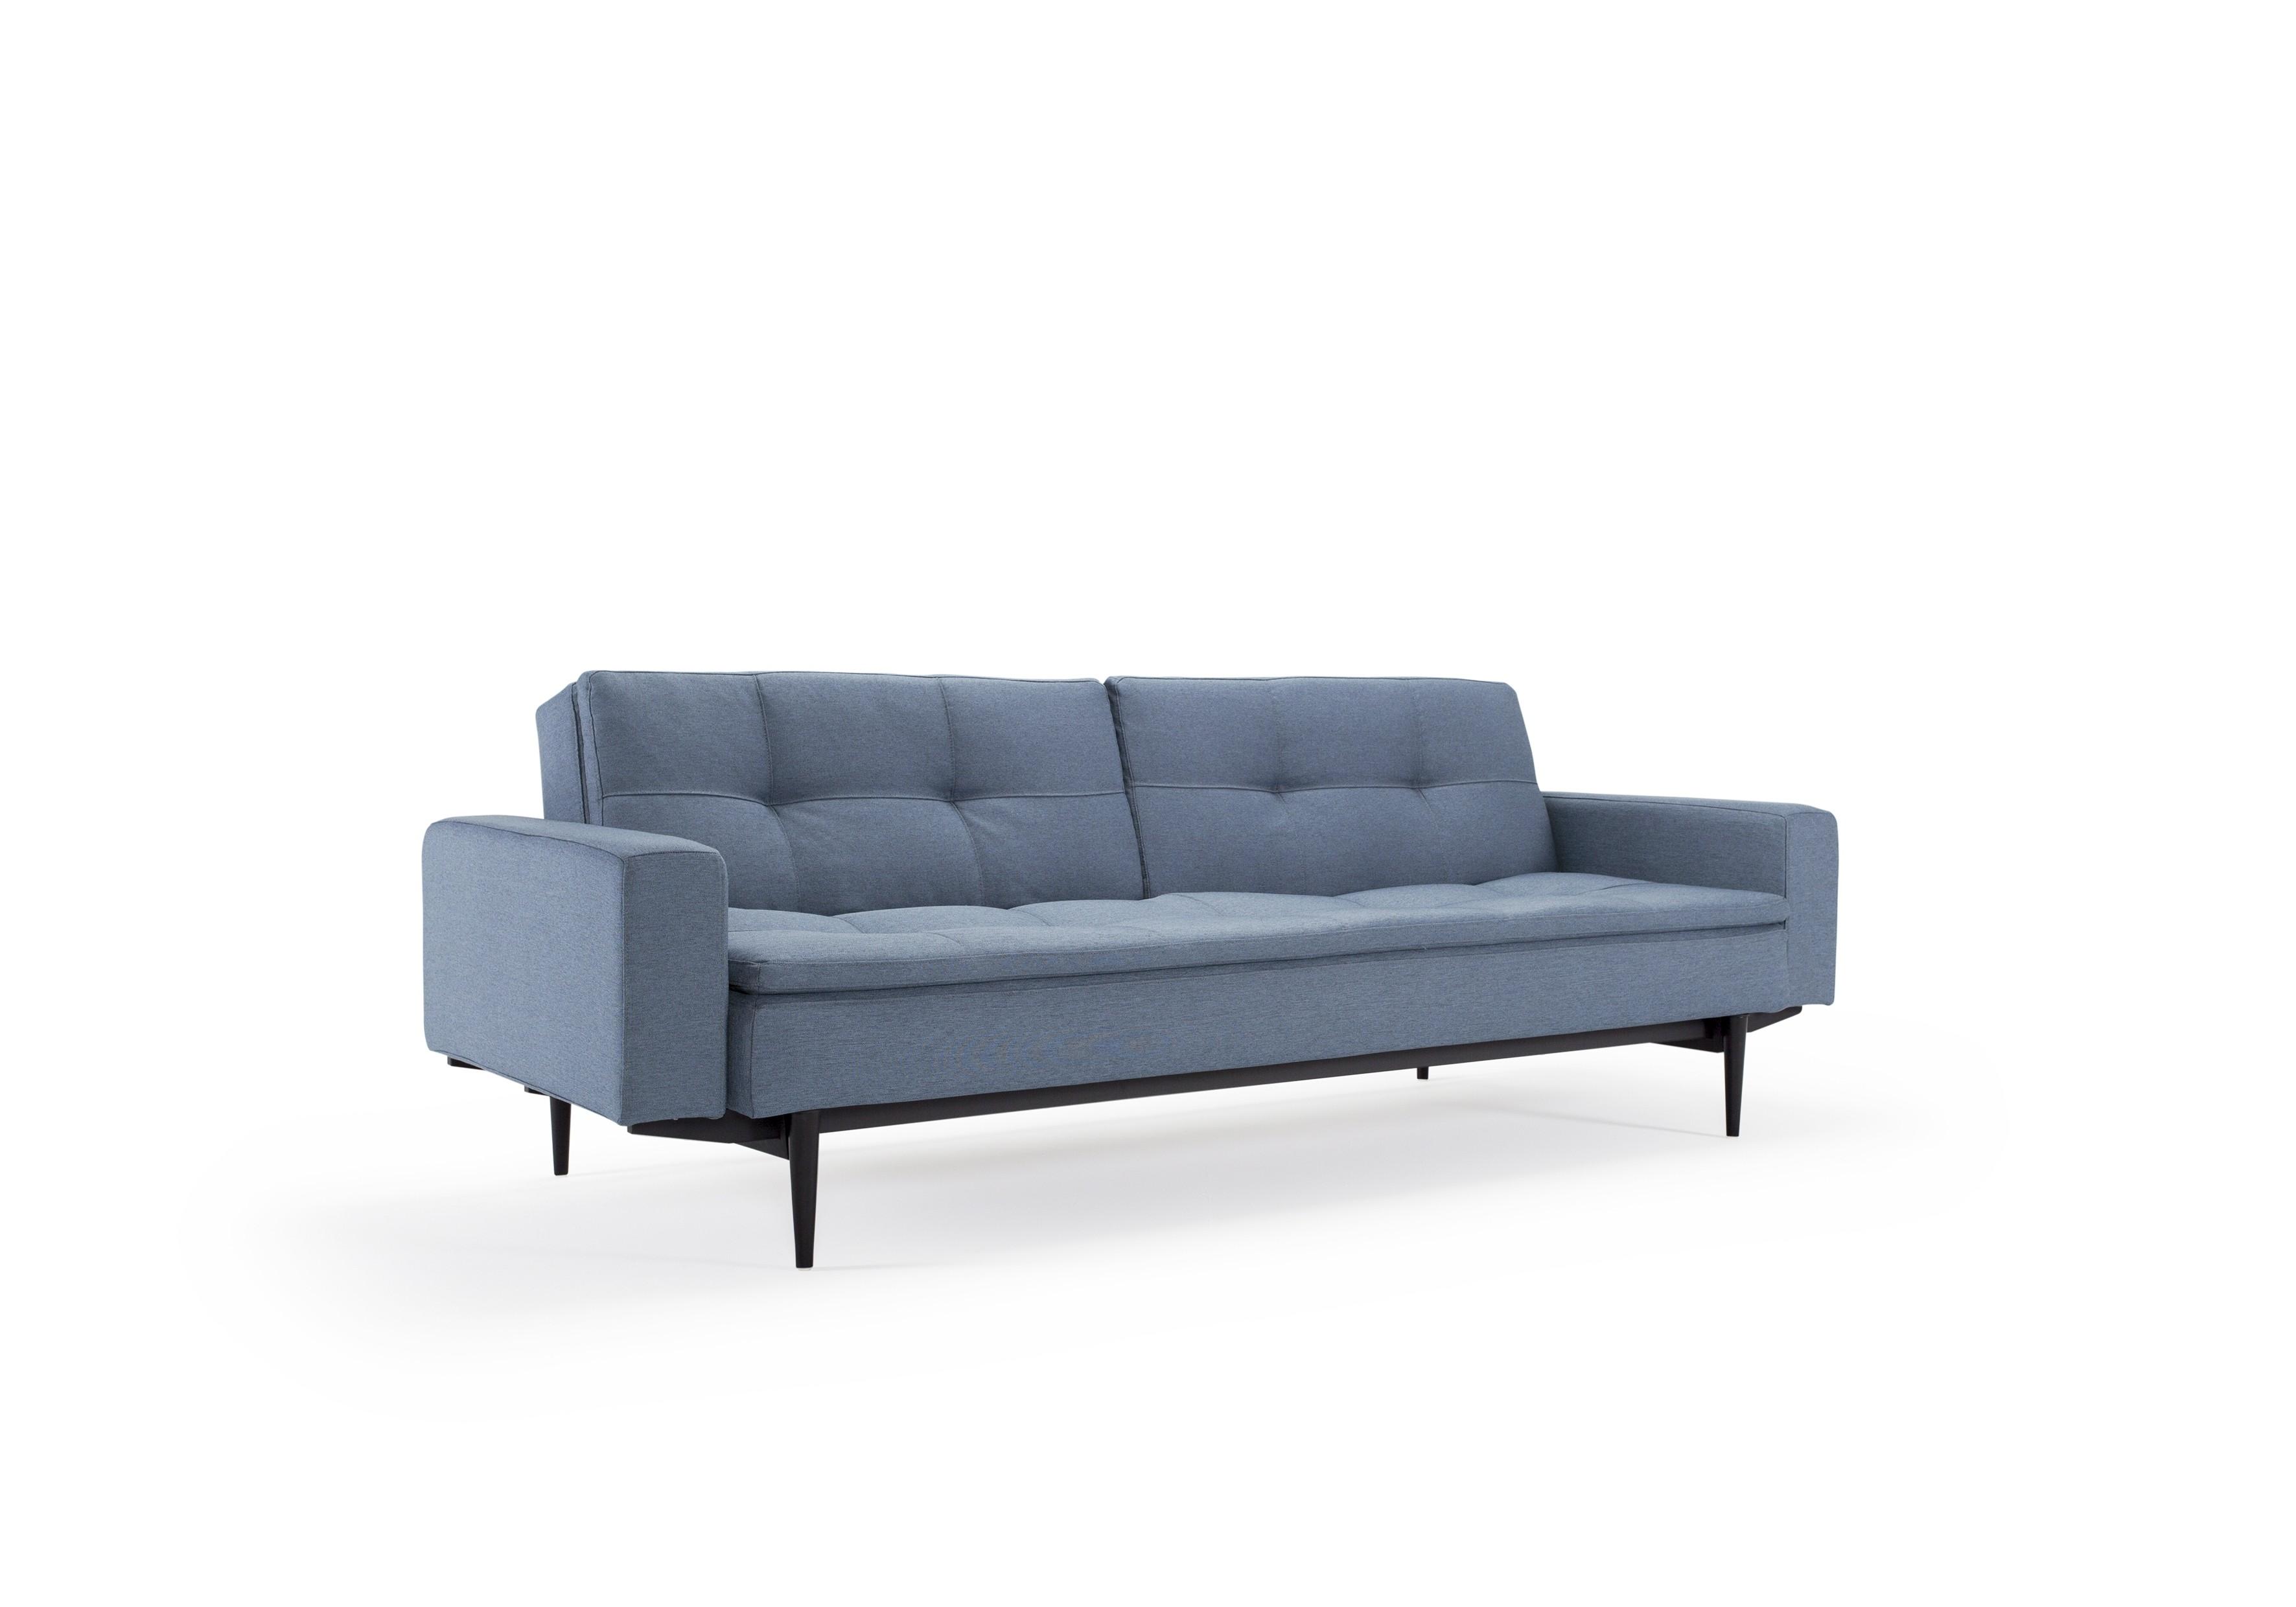 Dublexo sovesofa med polstrede armlæn. 115 x 210 cm. 3 farver.-20